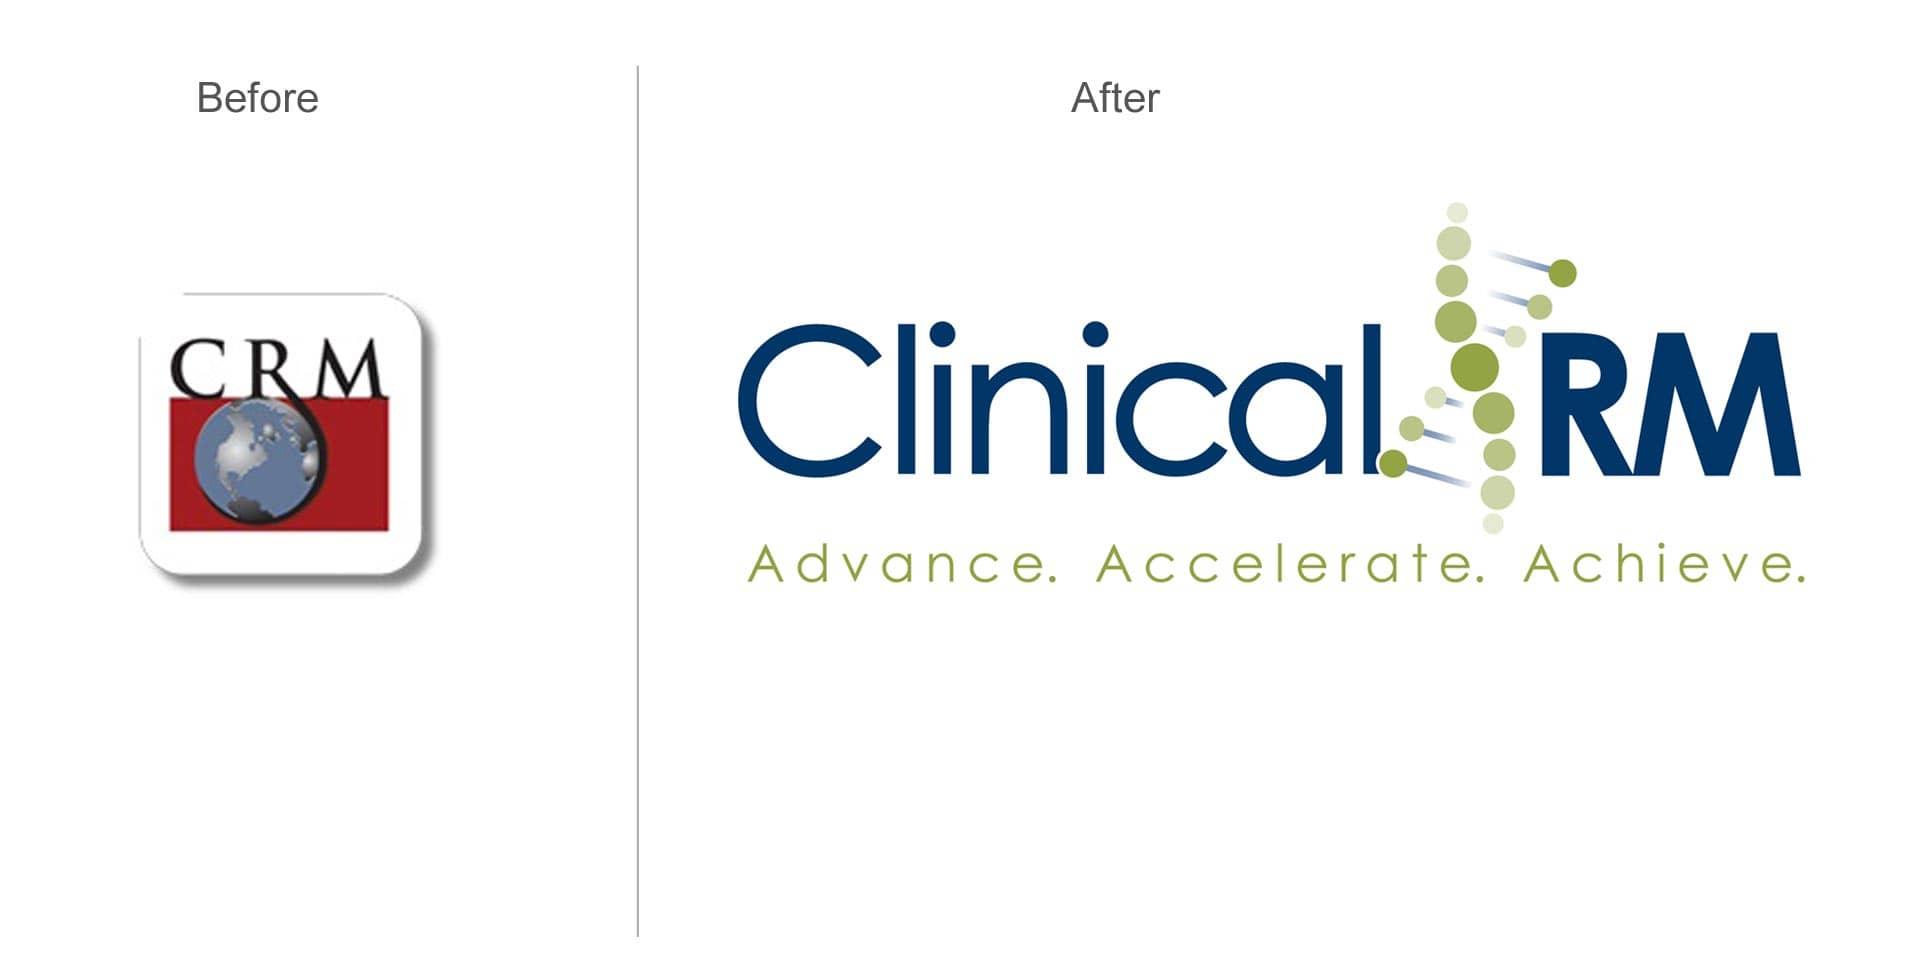 ClinicalRM Coporate Identity